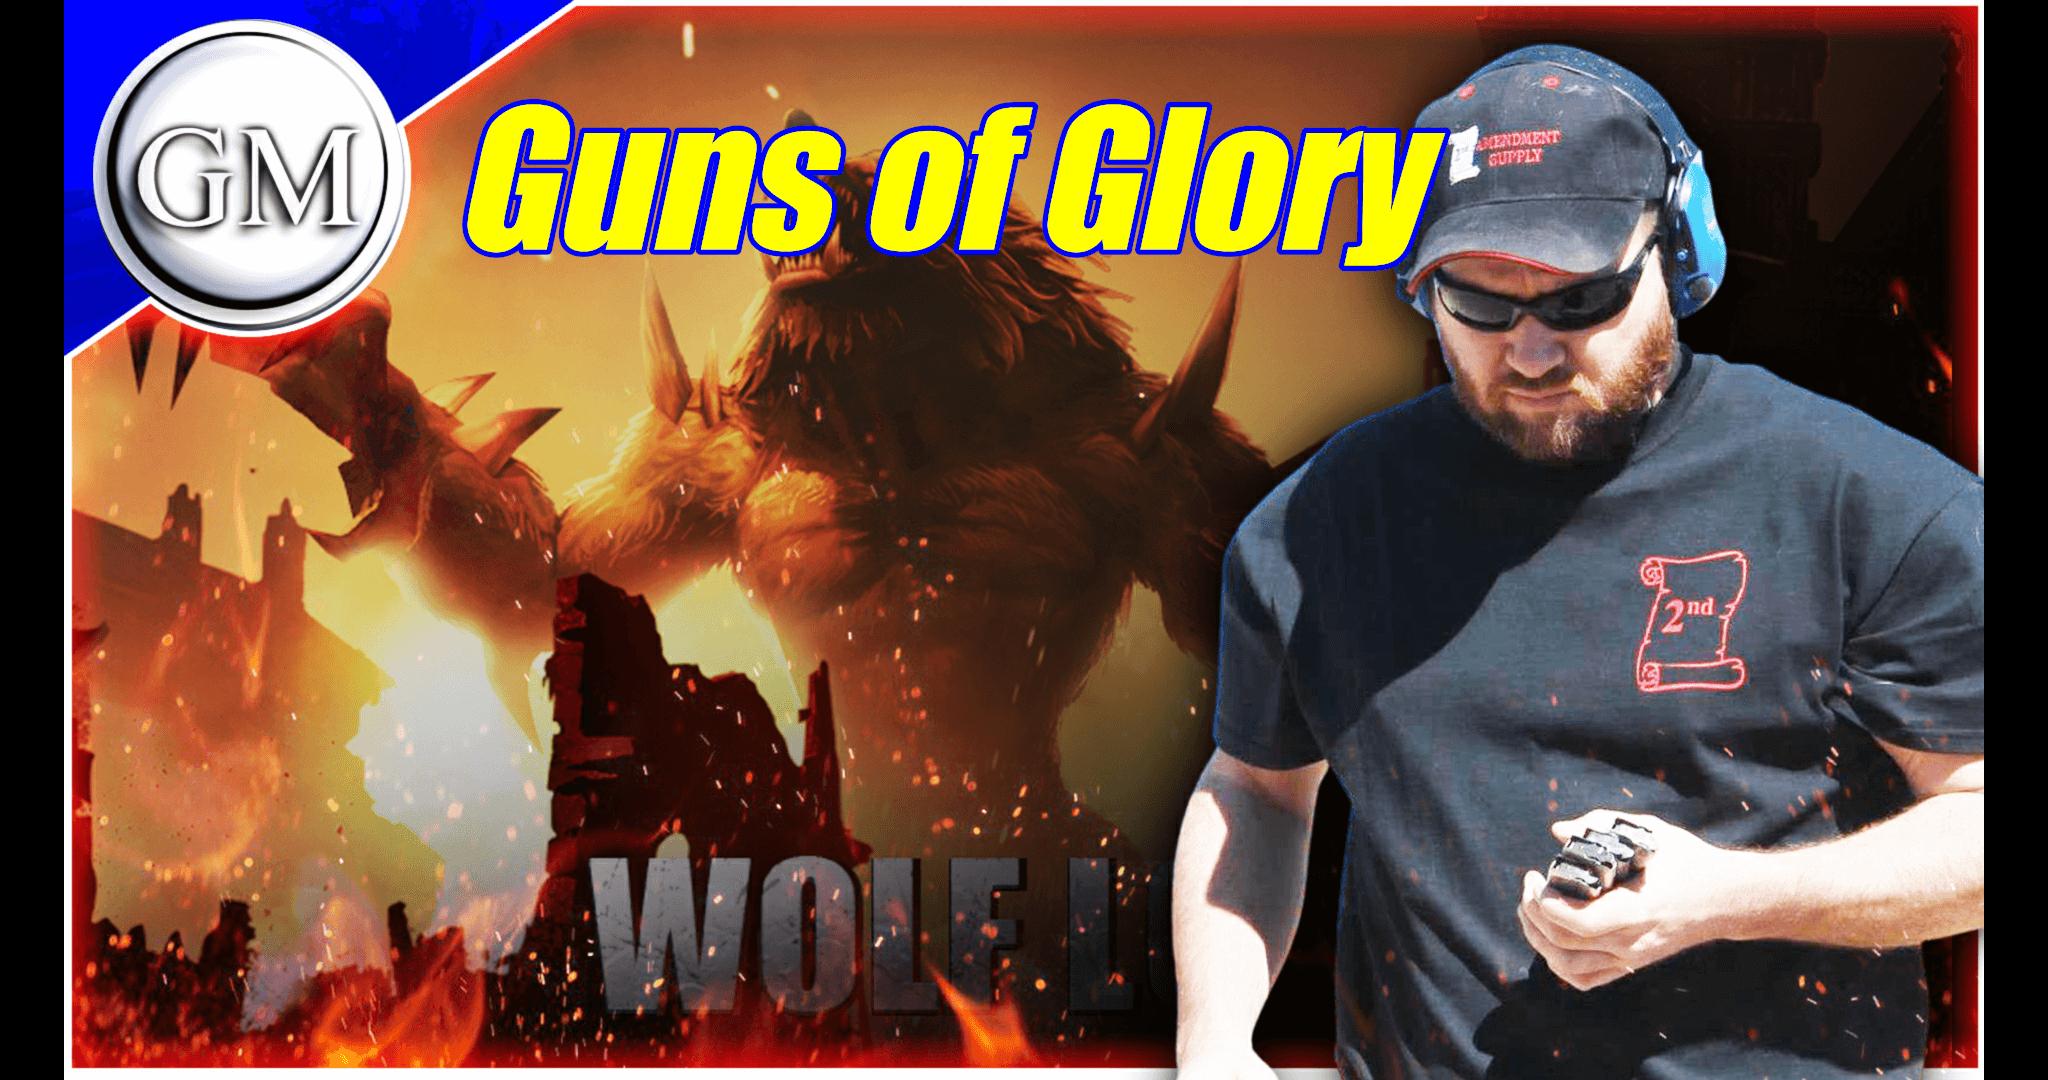 RogersRaiders.com Guns of Glory